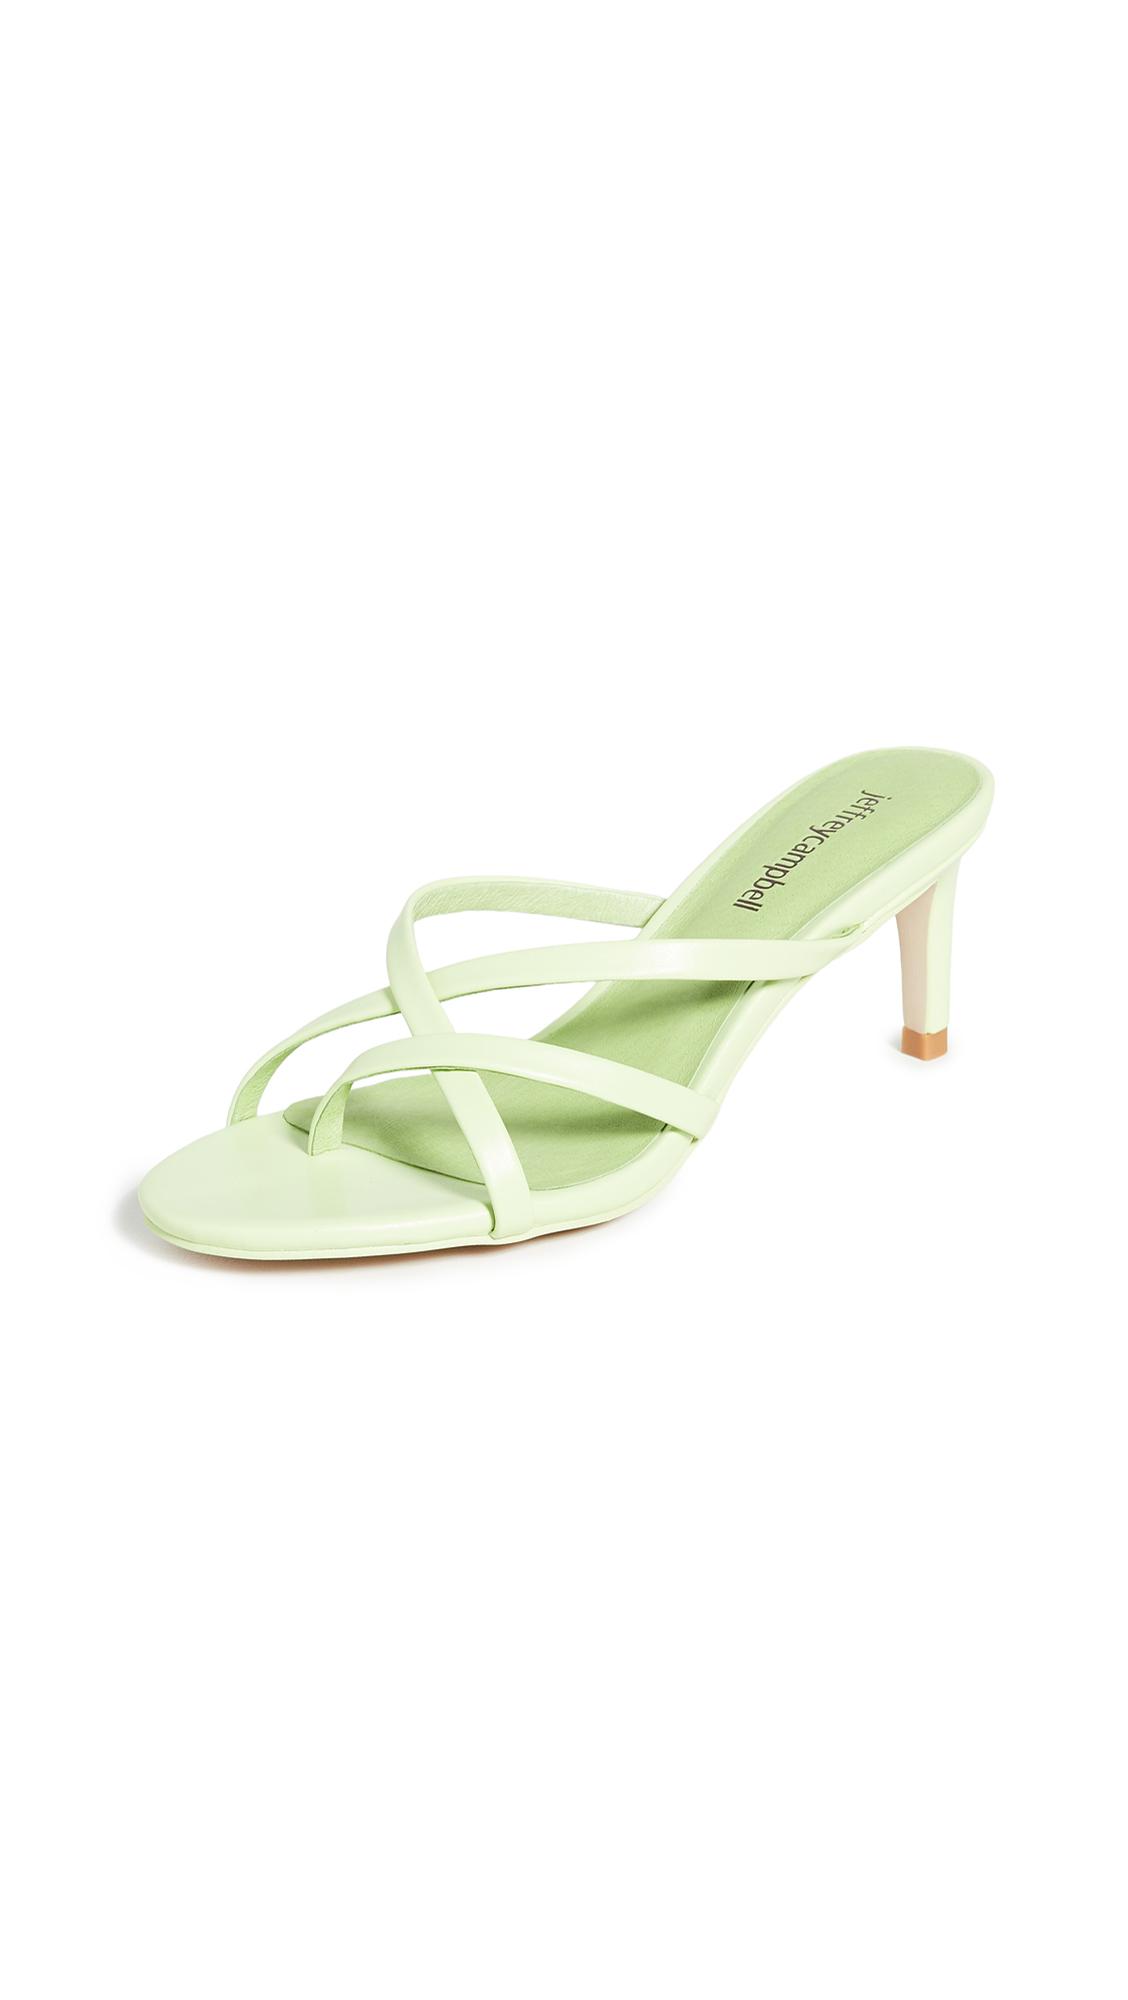 Photo of Jeffrey Campbell Ficelle Sandals - shop Jeffrey Campbell Sandals, Flat online